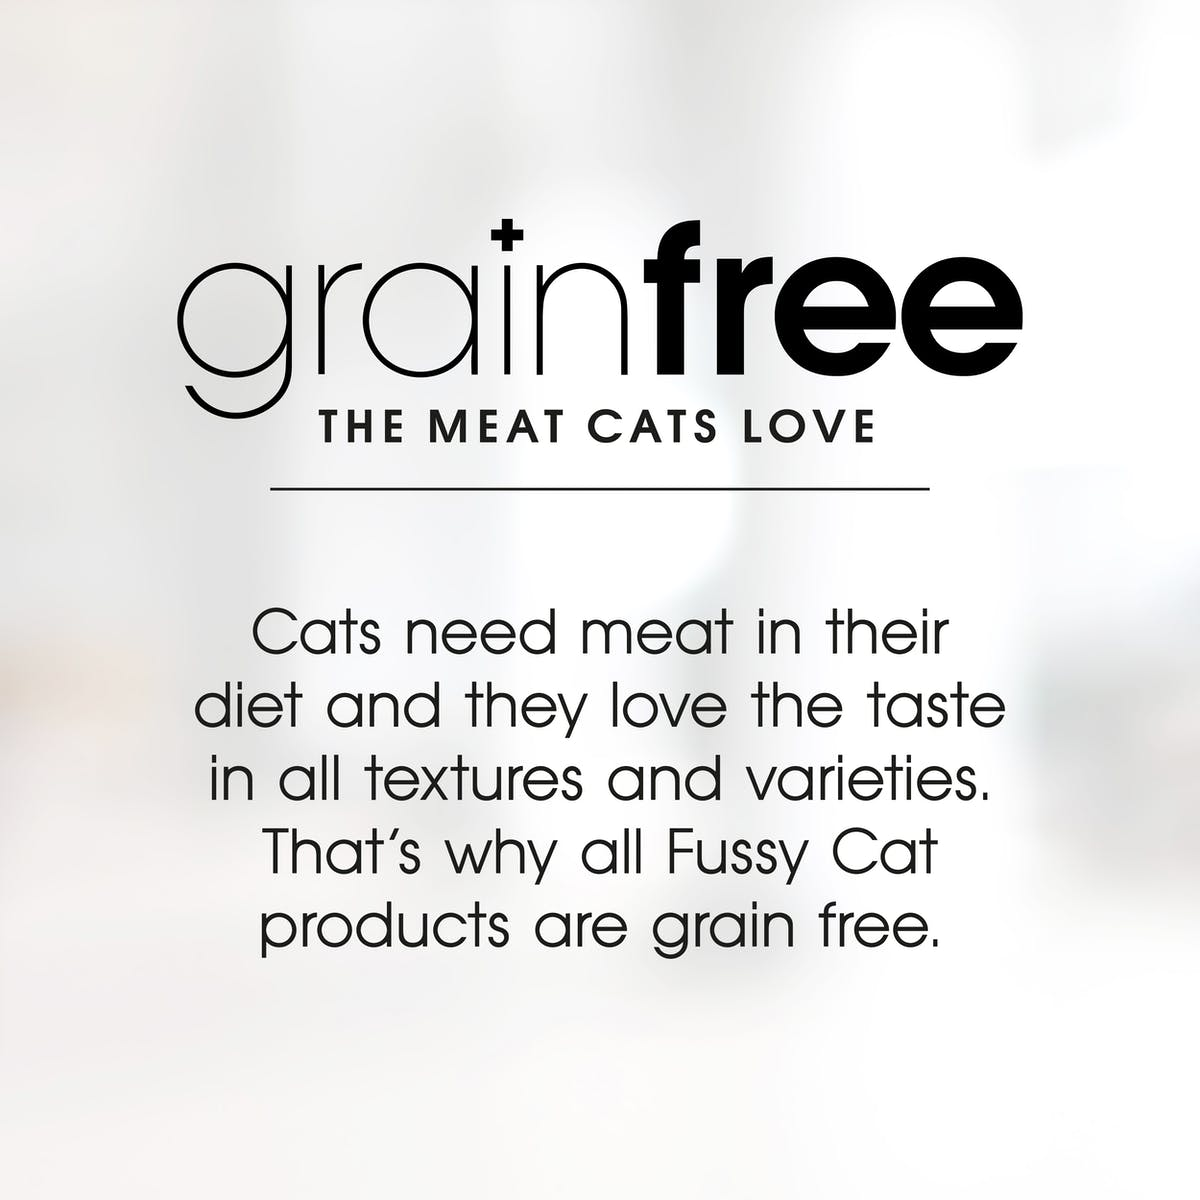 Fussy Cat | Bites & Chicken Gravy | Wet Cat Food